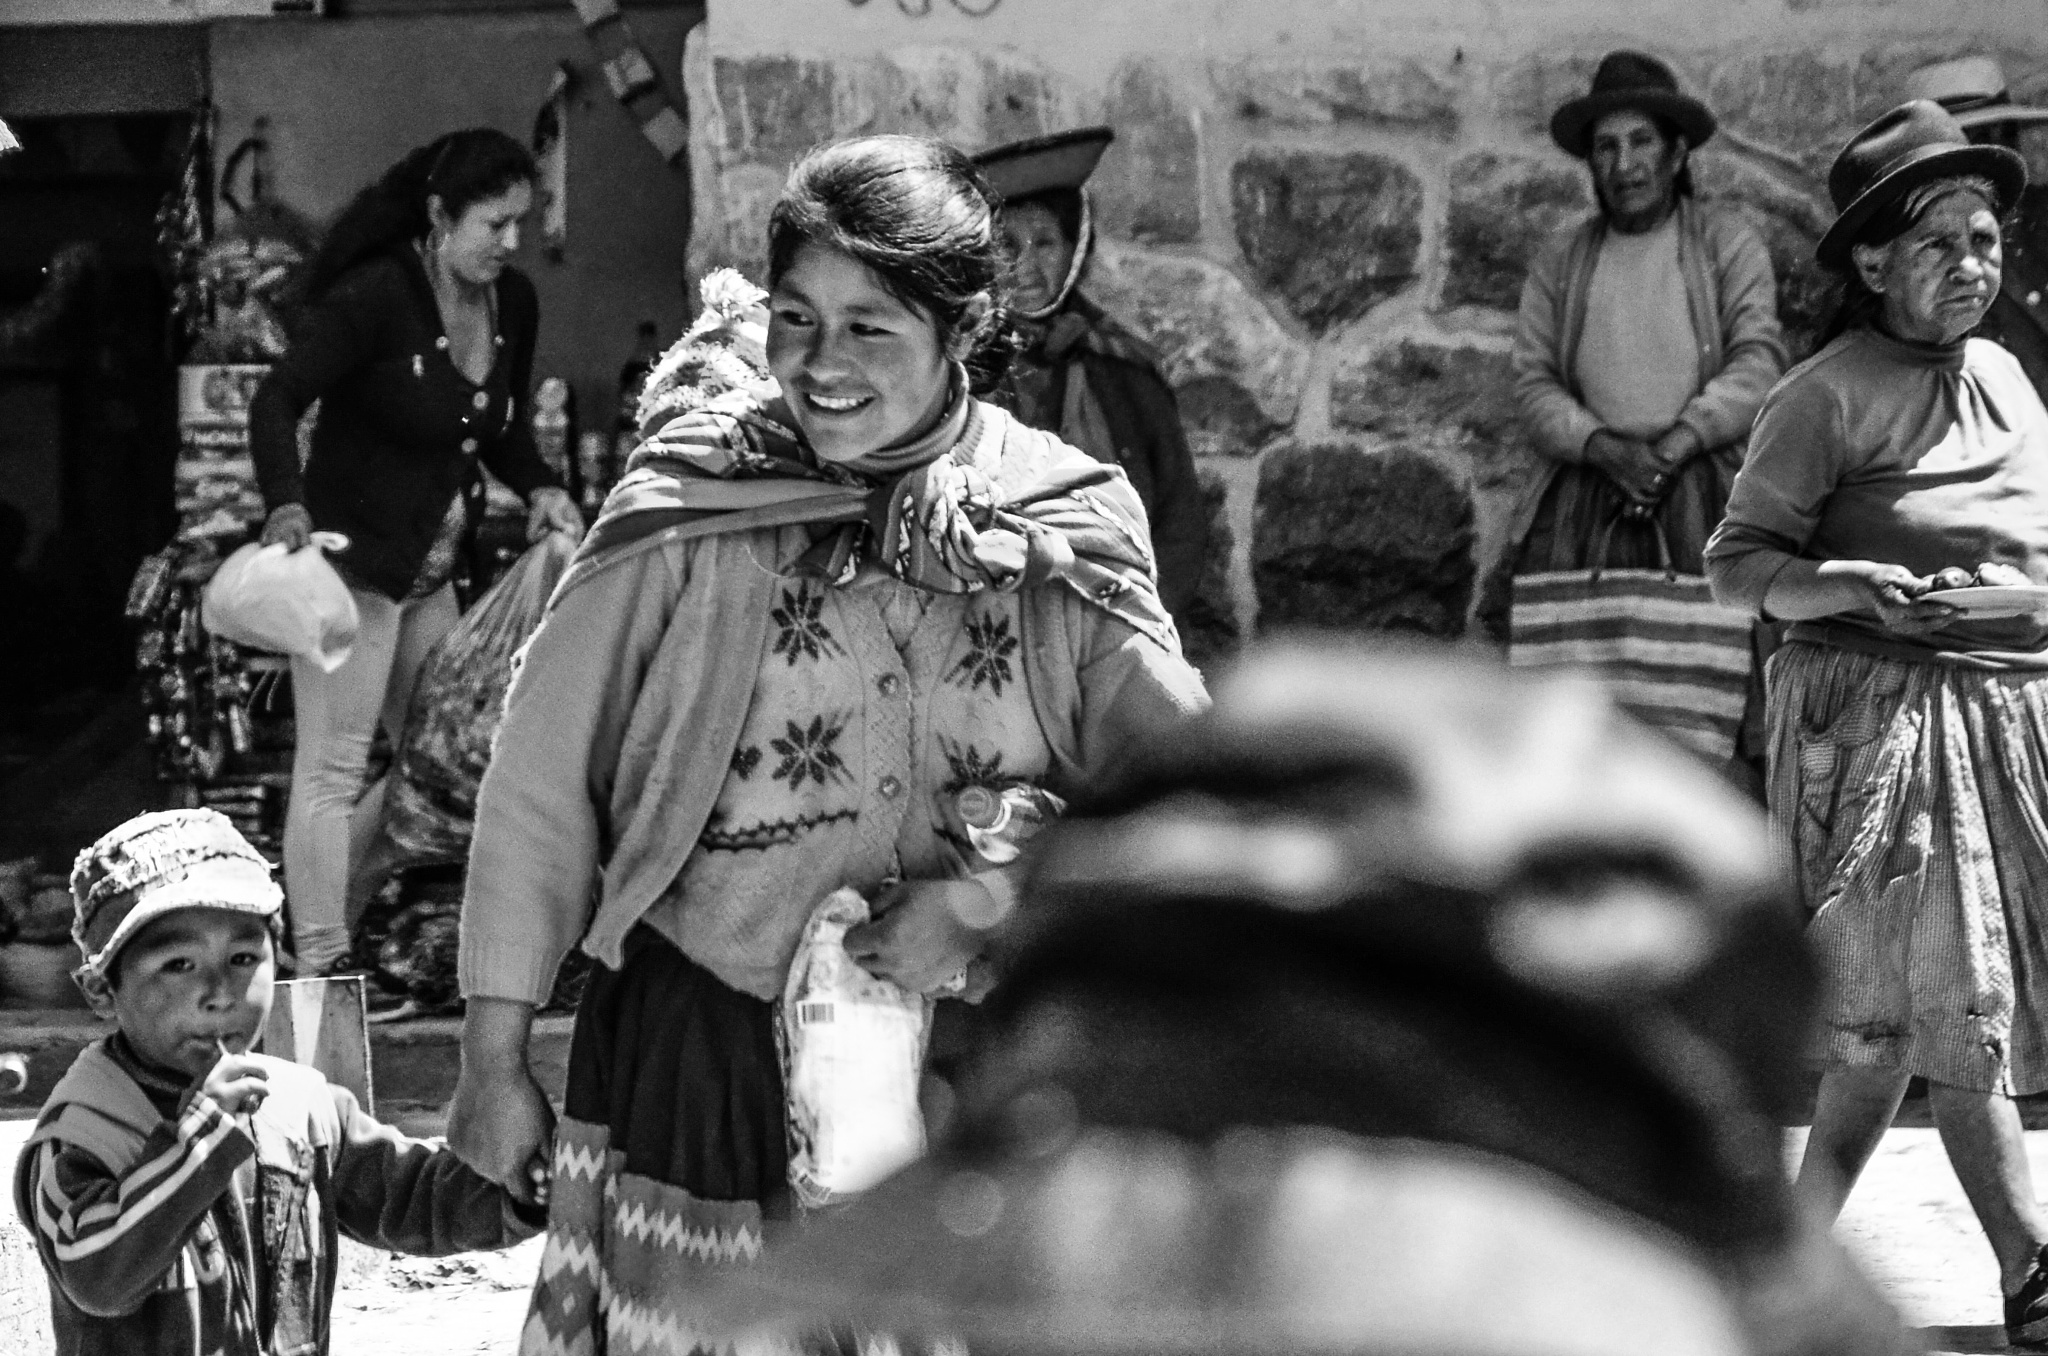 PERU. Ollantaytambo. 2o14 by Marcio Bertolucci